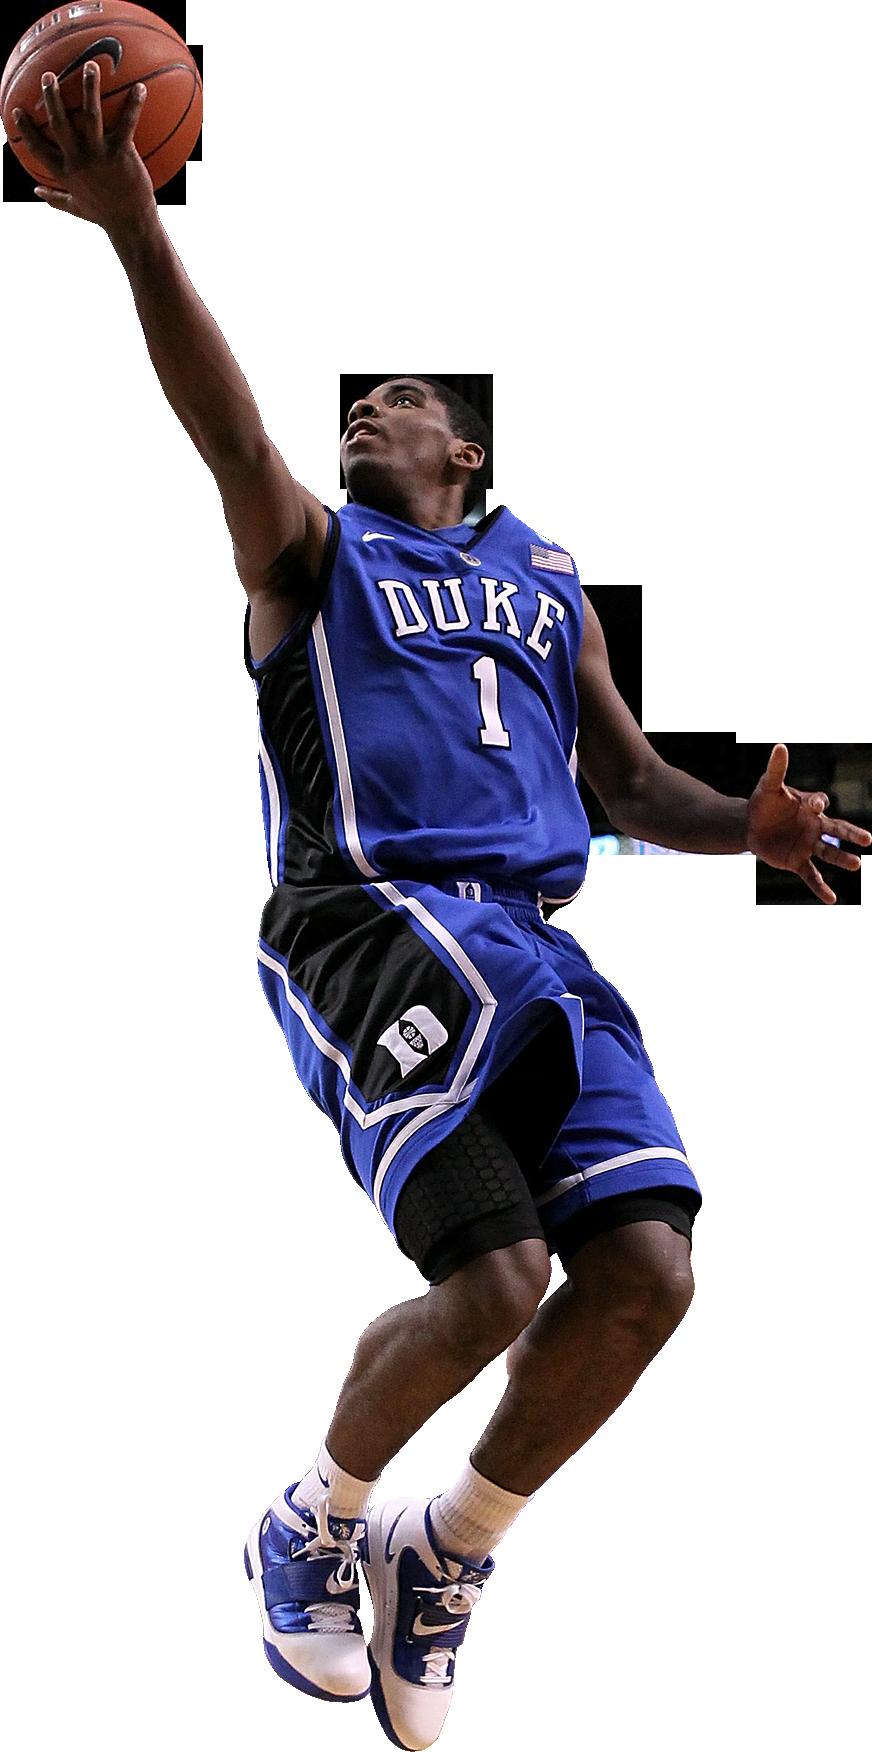 Pin By Milu Cheng On Ki Kyrie Irving Sports Basketball Duke Basketball